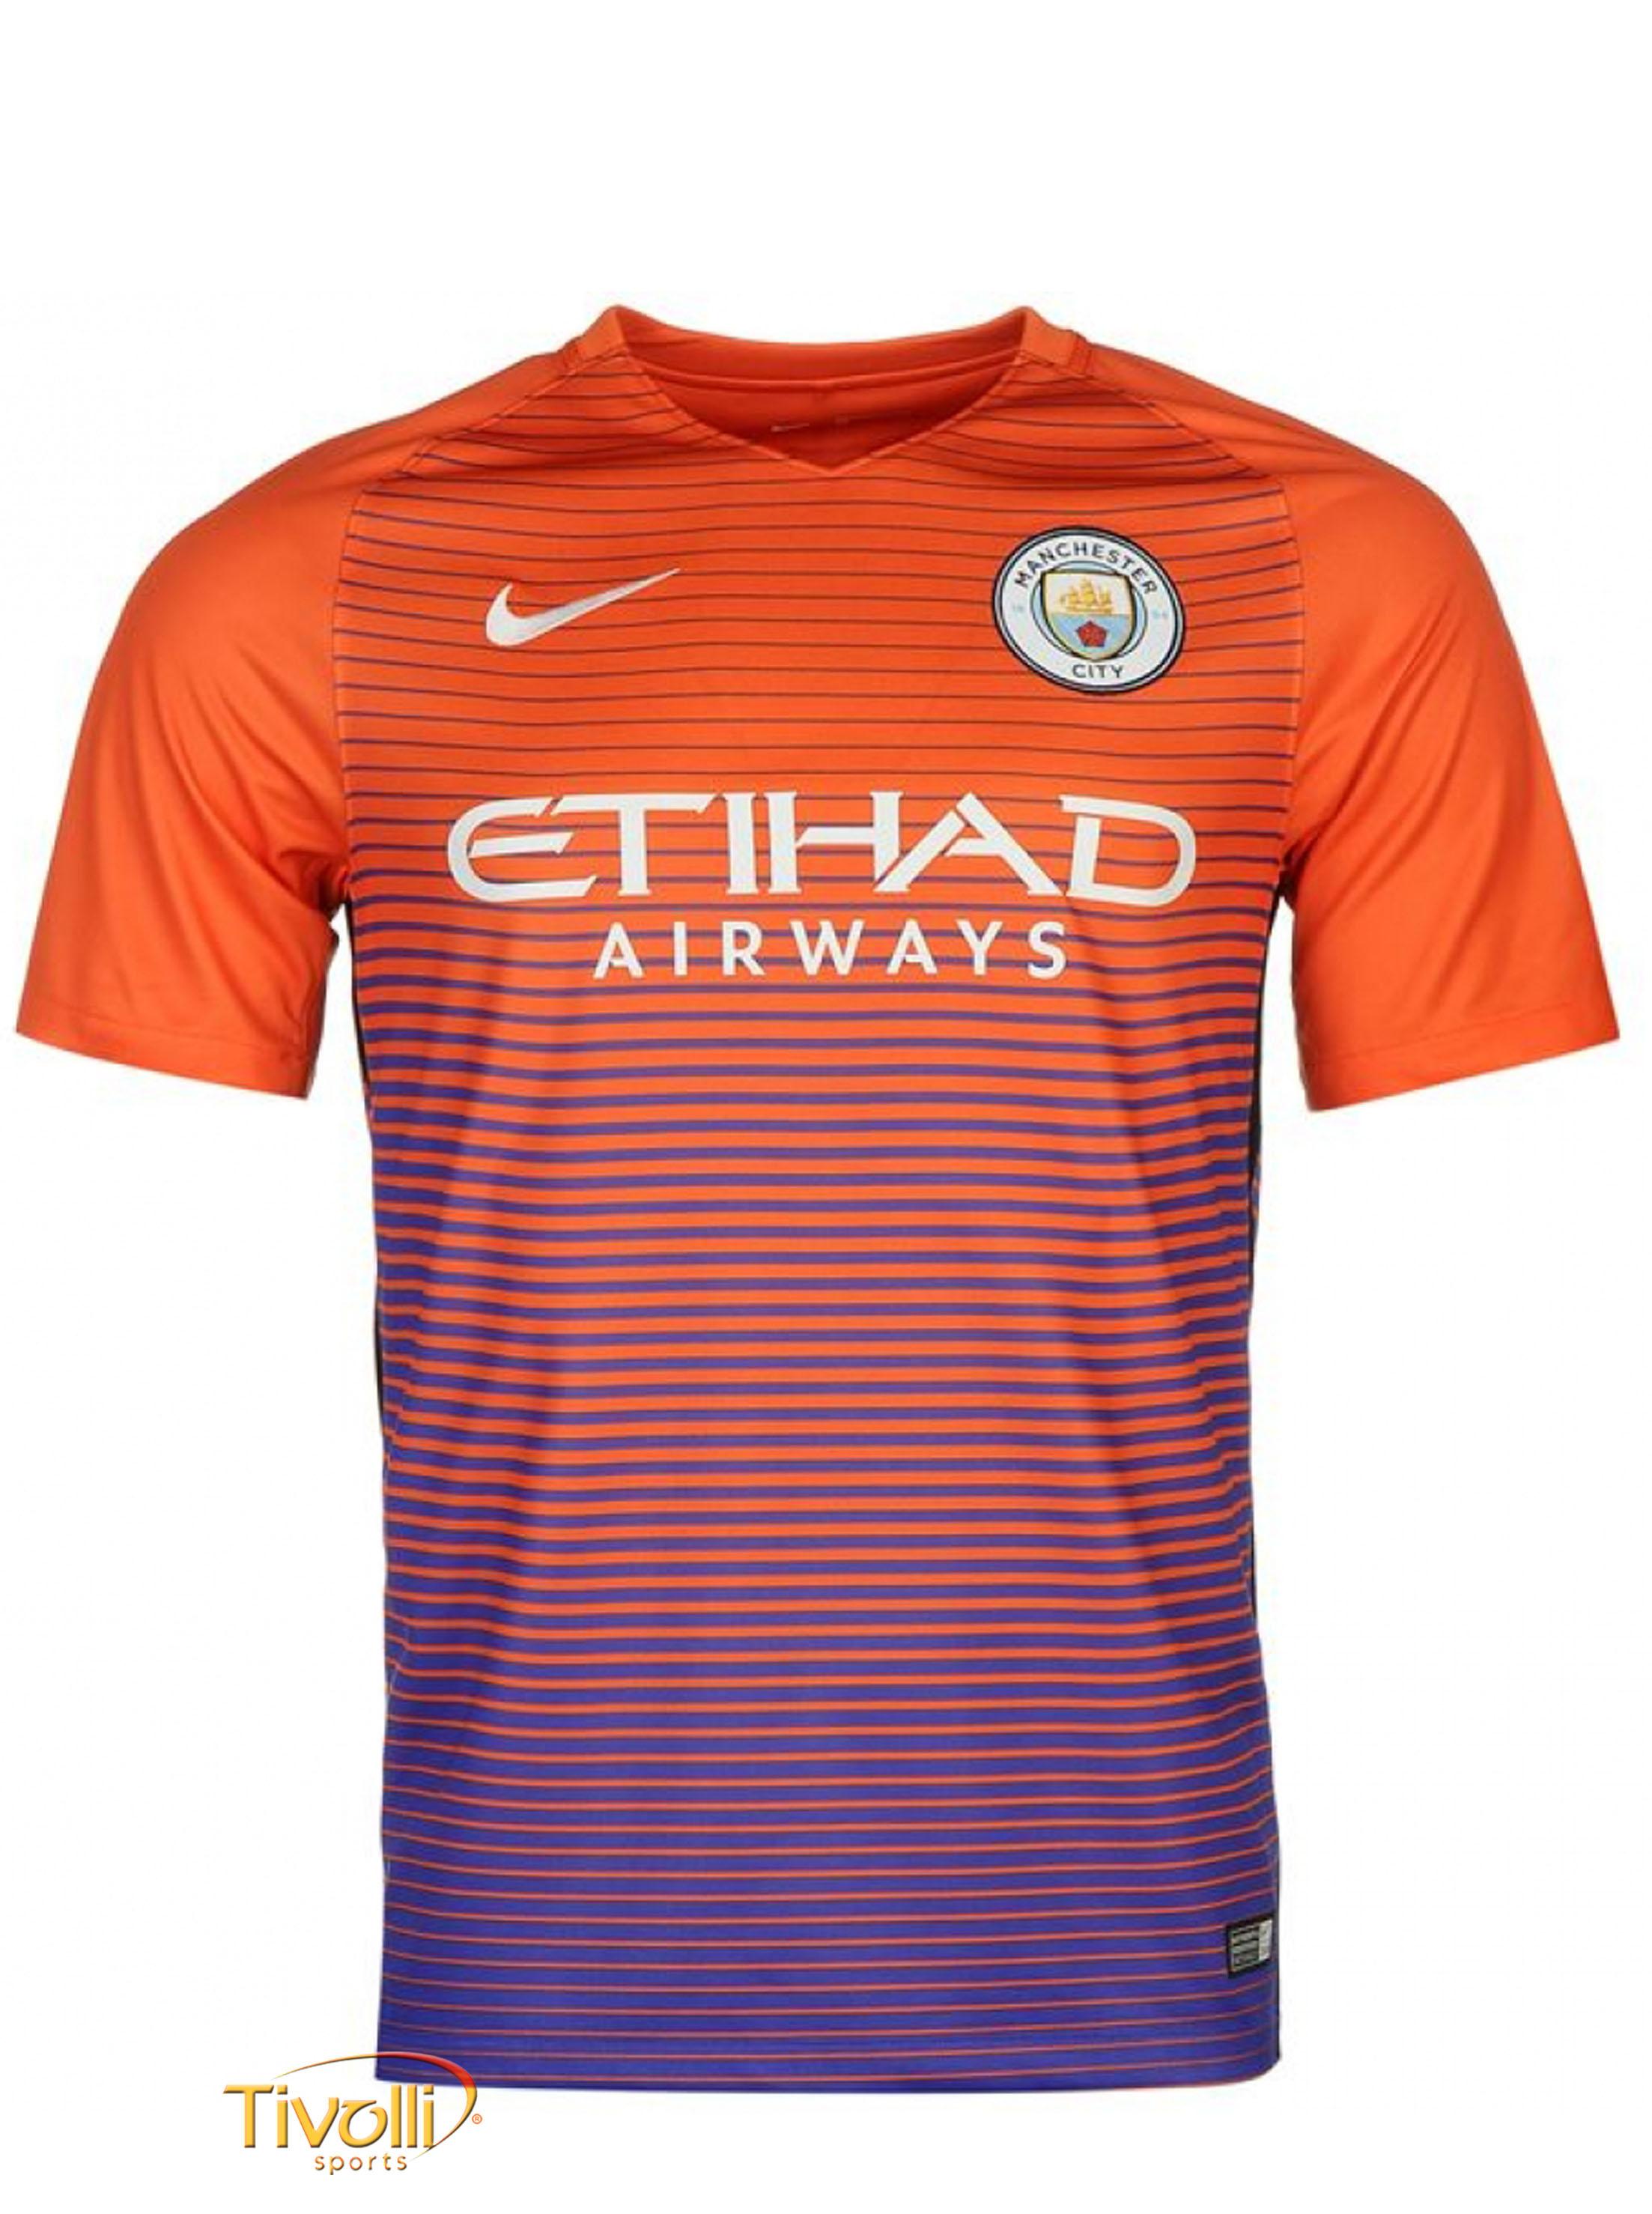 cf6fdadaa1b55 Camisa Manchester City III 2016 17 Nike Infantil   - Mega Saldão